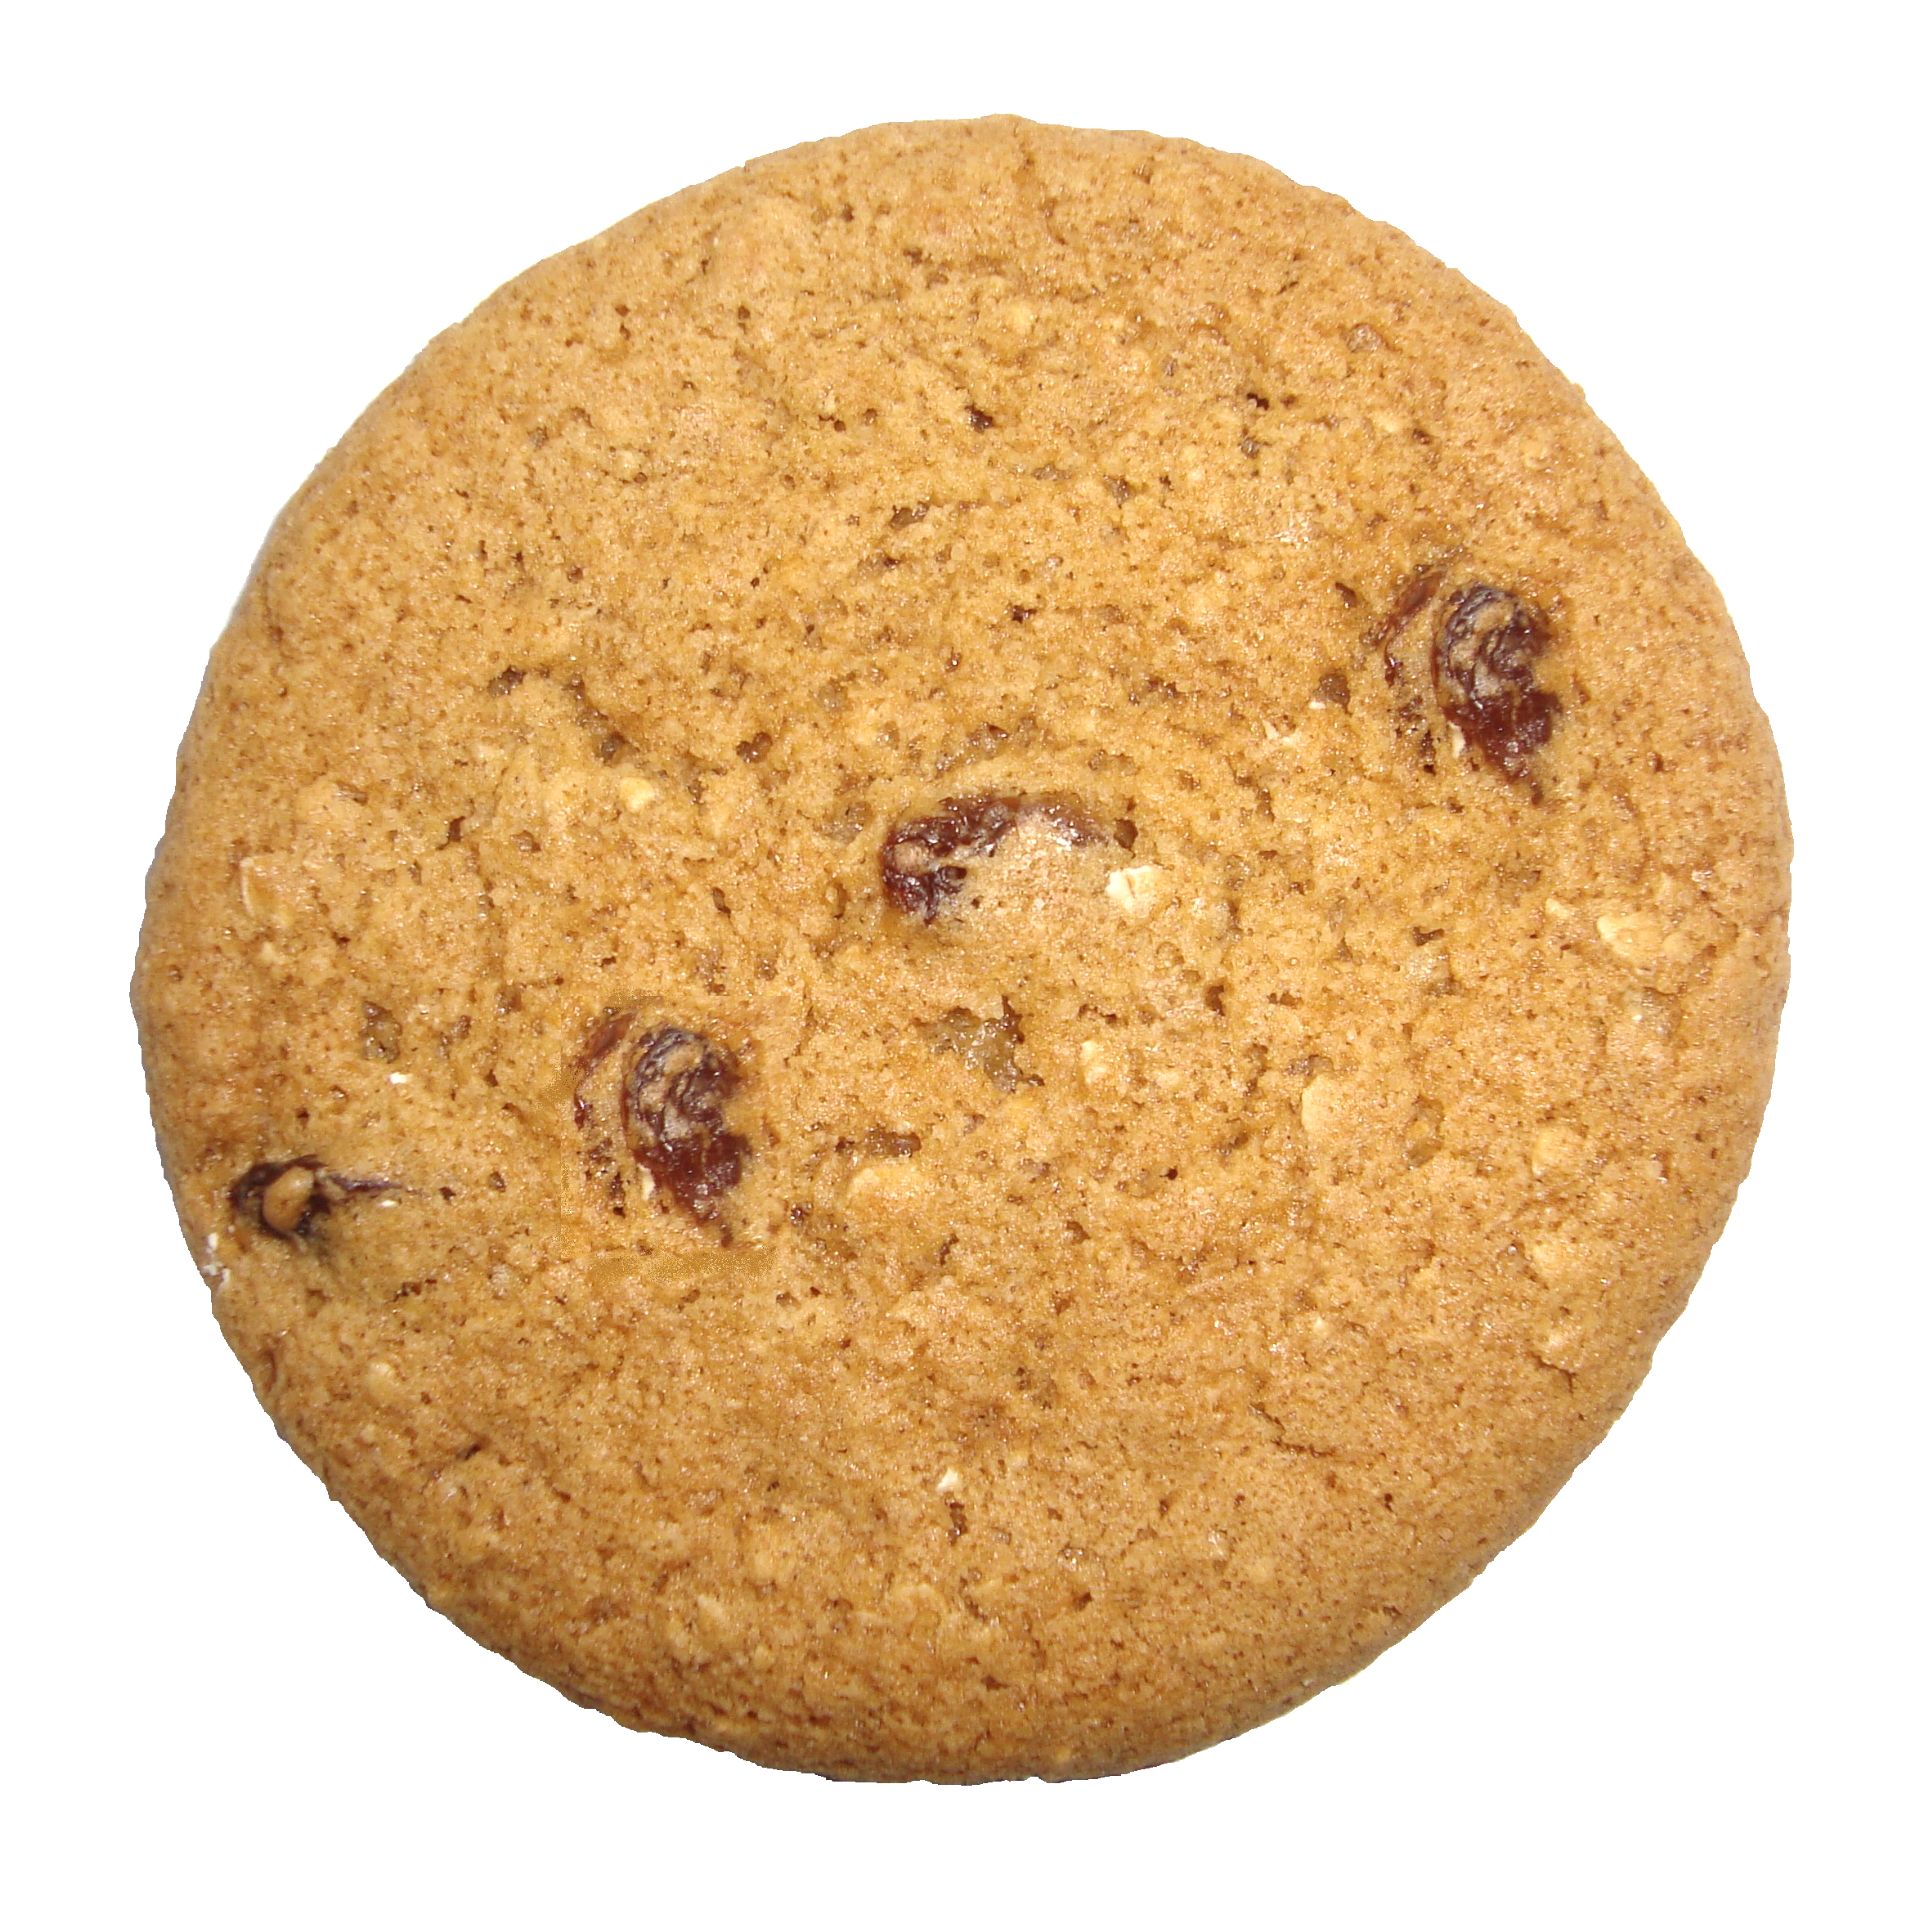 cookie oat raisin2_edited.jpg